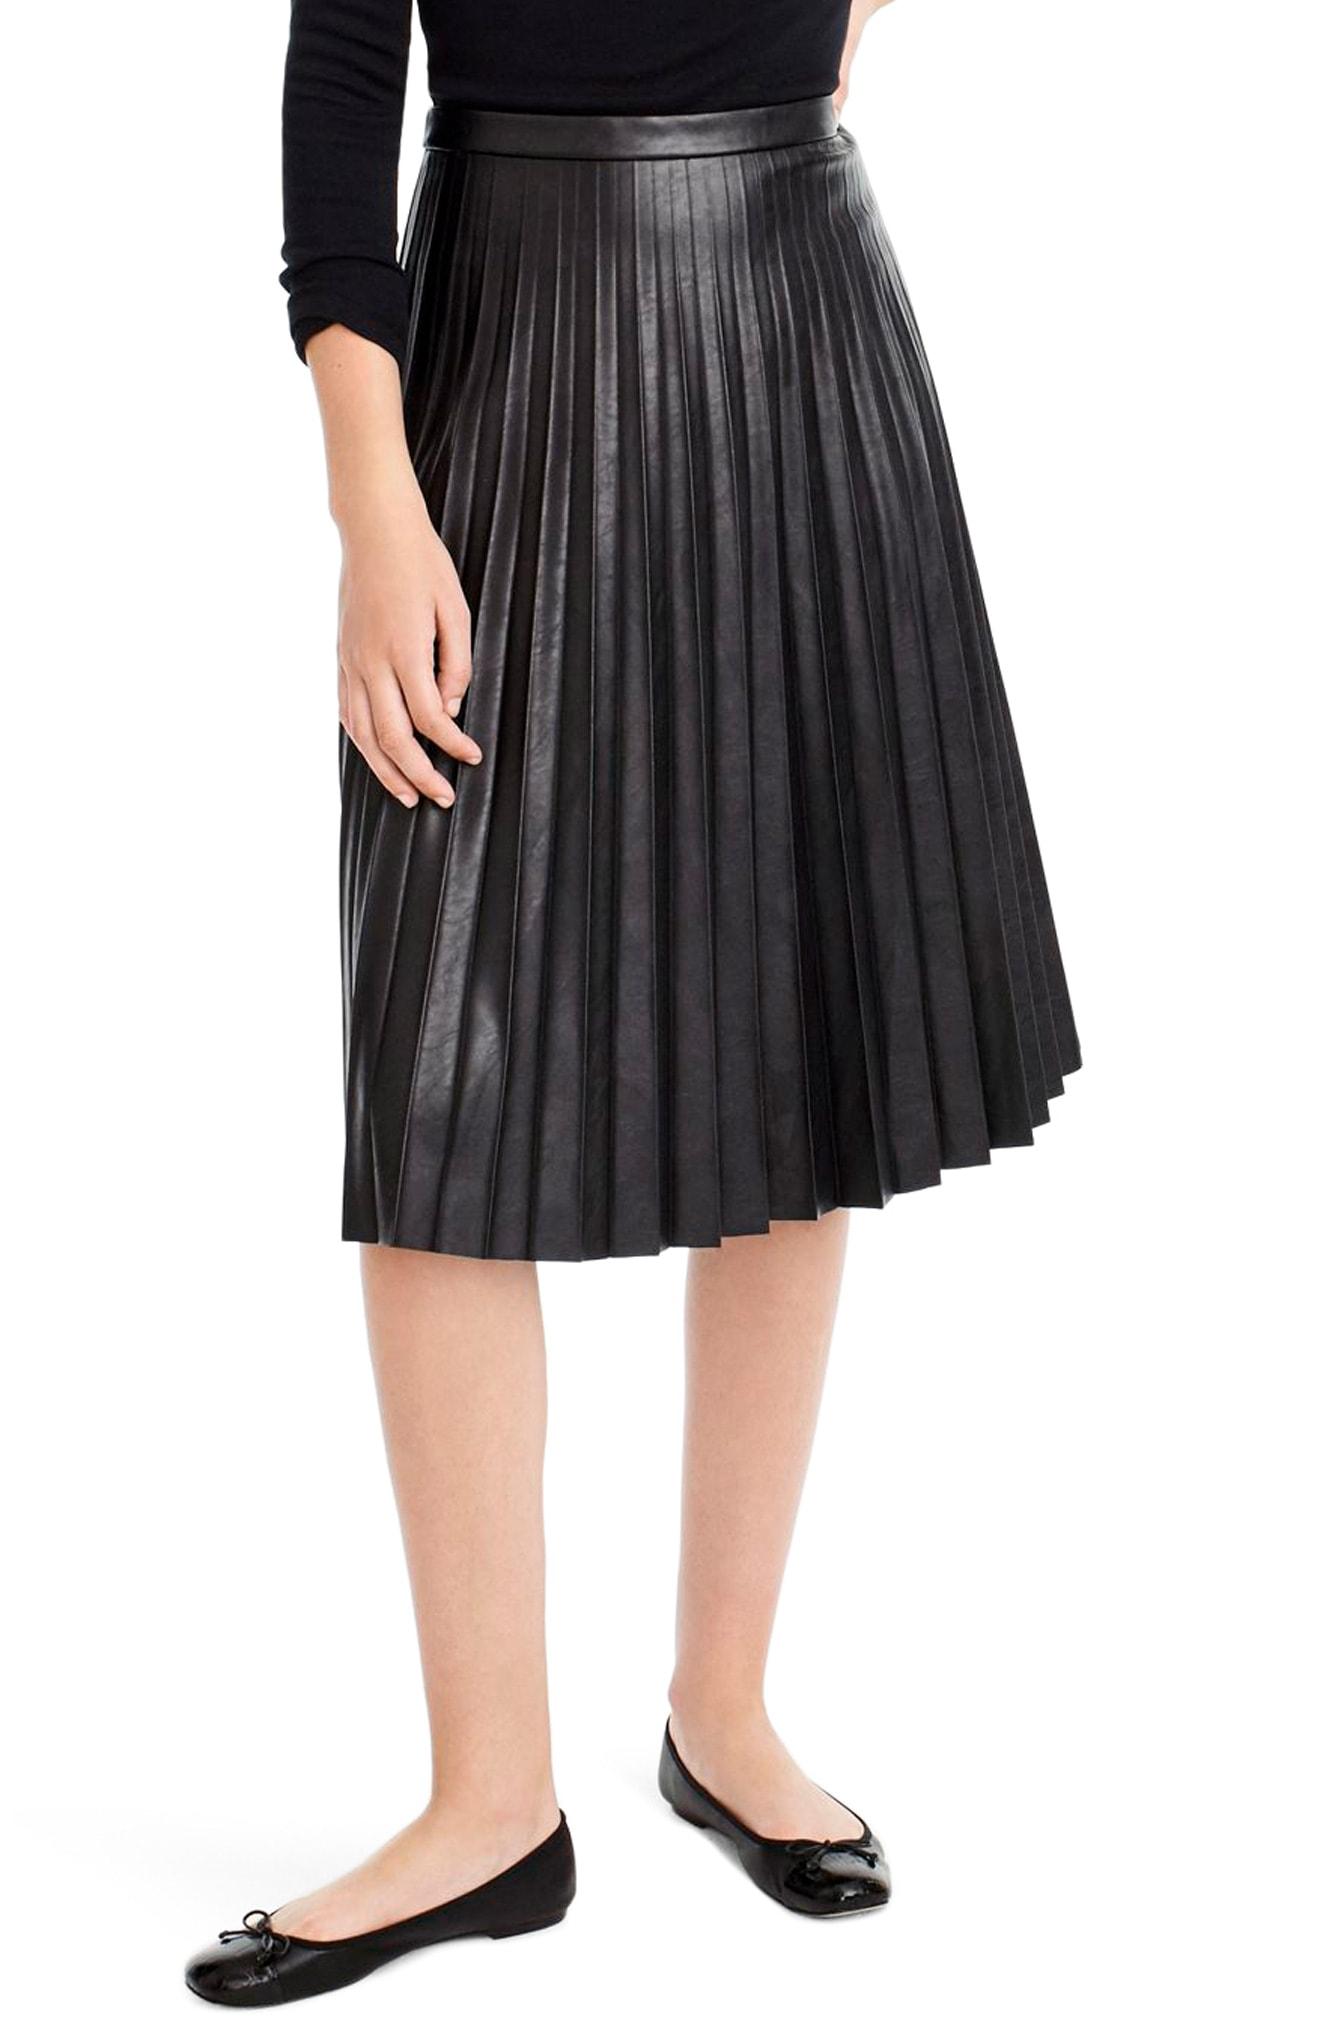 J.Crew Pleat Faux Leather Midi Skirt